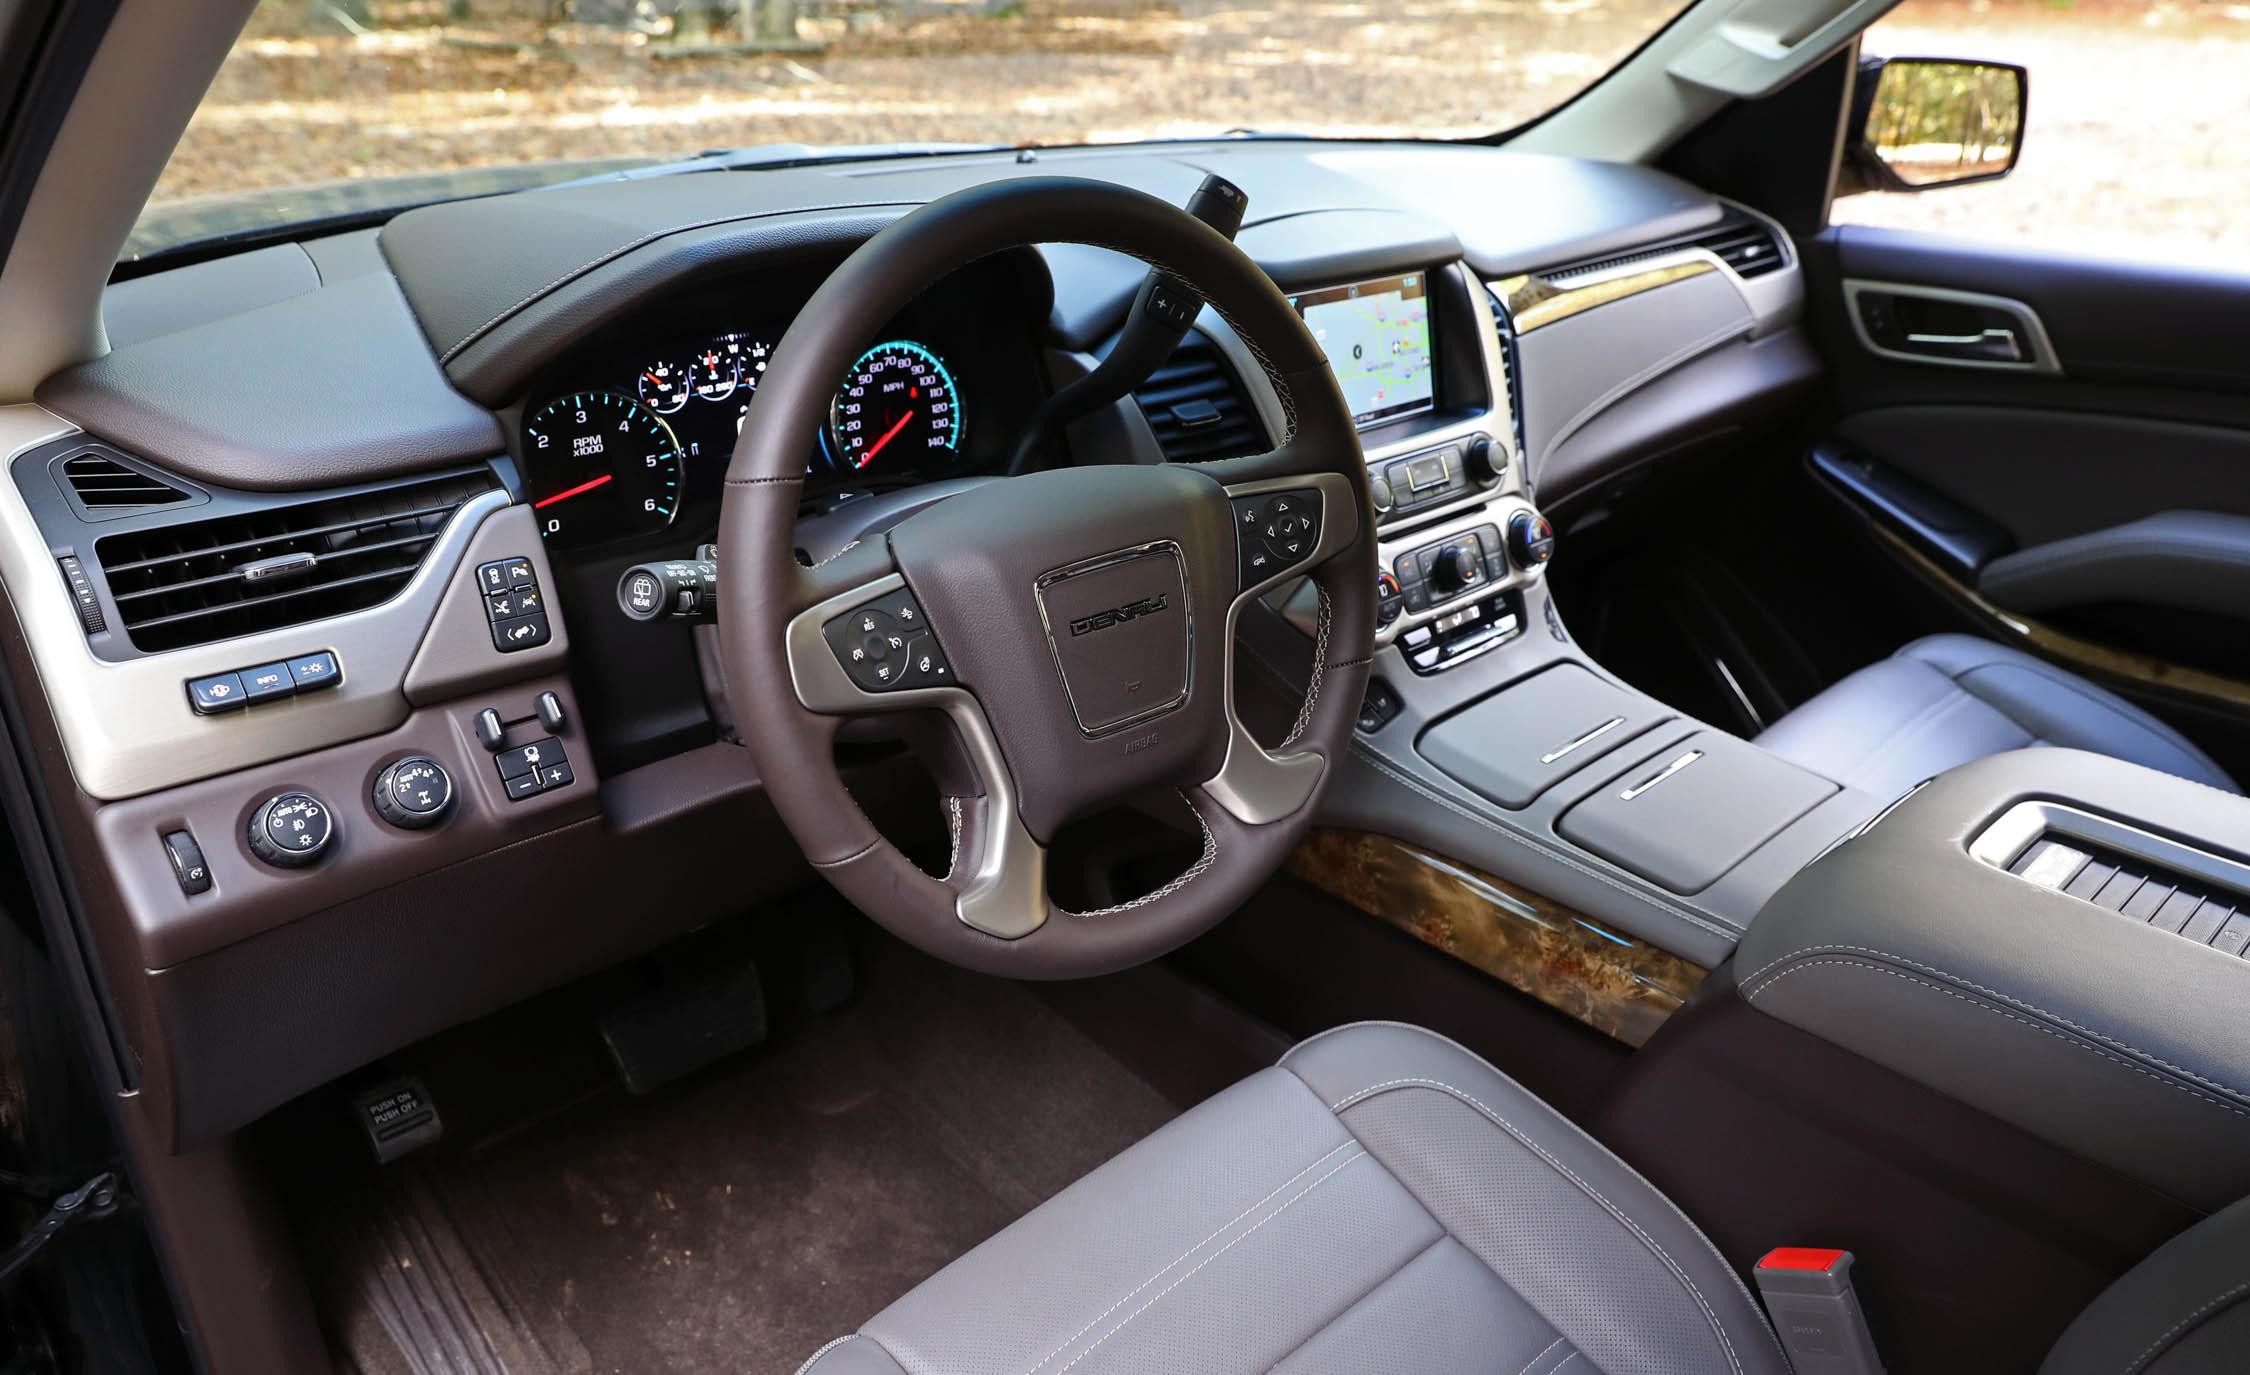 2017 Gmc Yukon Xl Denali Interior View Cockpit Steering (View 1 of 26)